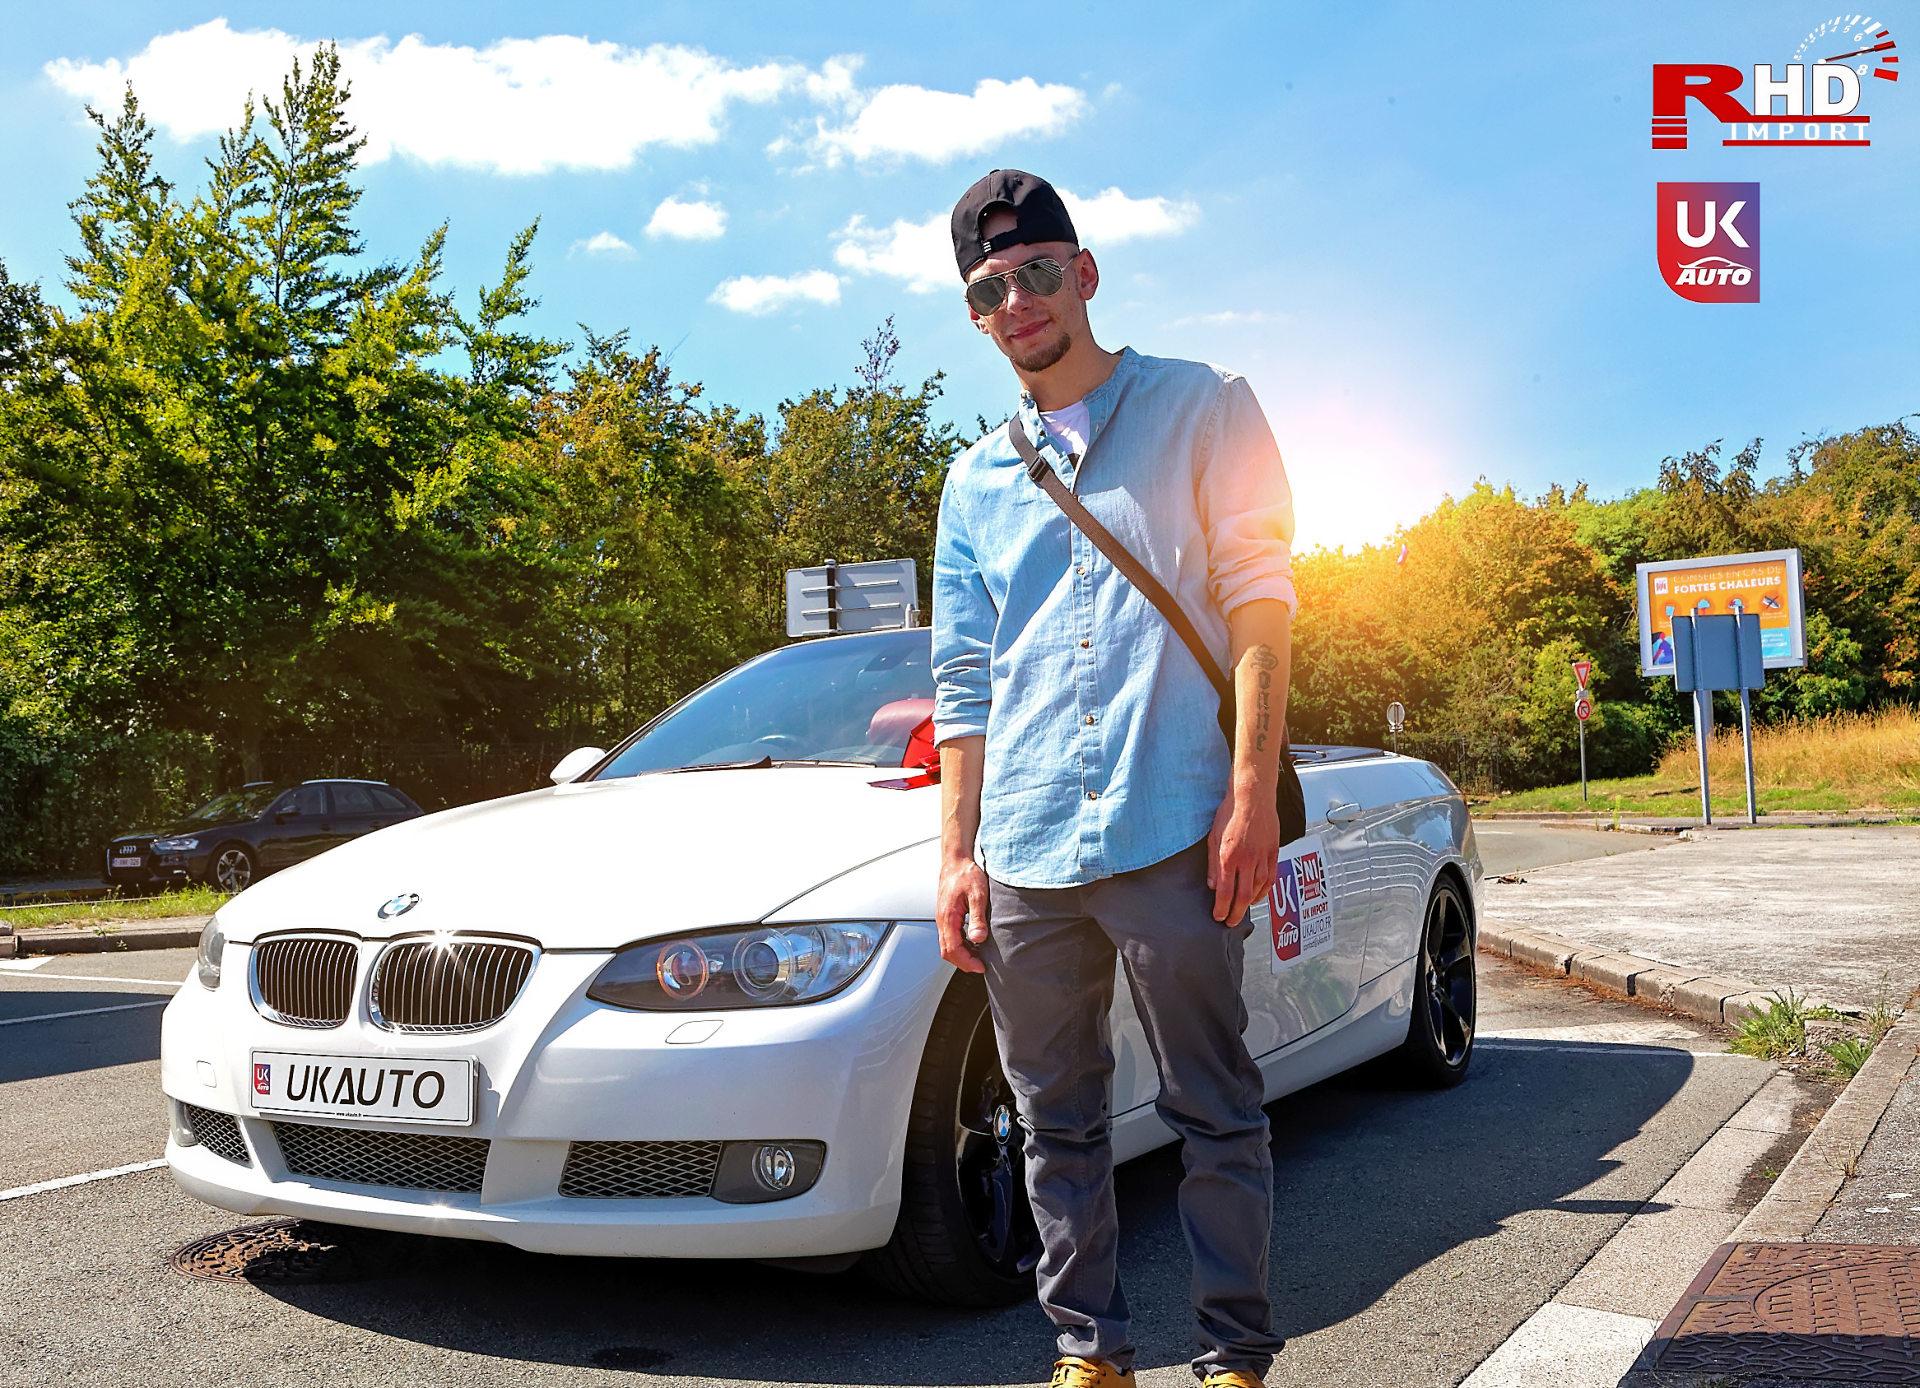 Bmw importation uk bmw 335i e92 rhd ukauto import voiture angleterre3 DxO - IMPORT AUTO BMW 335 I PACK M MANDATAIRE UK FELICITATION A ANTOINE CLIENT SATISFAIT